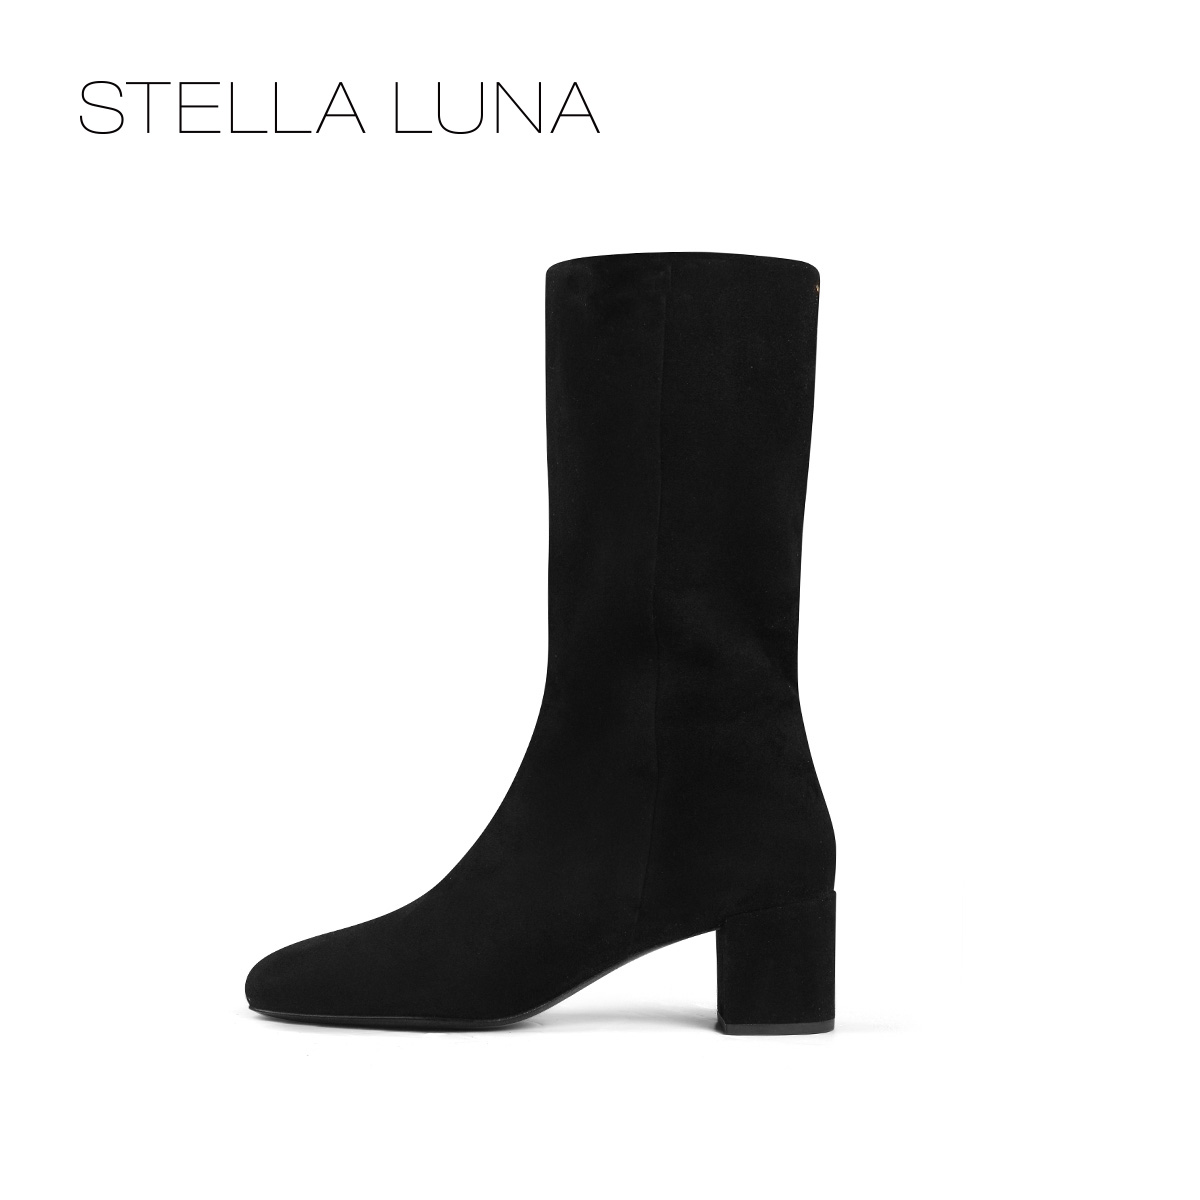 STELLA LUNA冬季时尚简约粗跟中跟长筒靴女靴SG310C22123